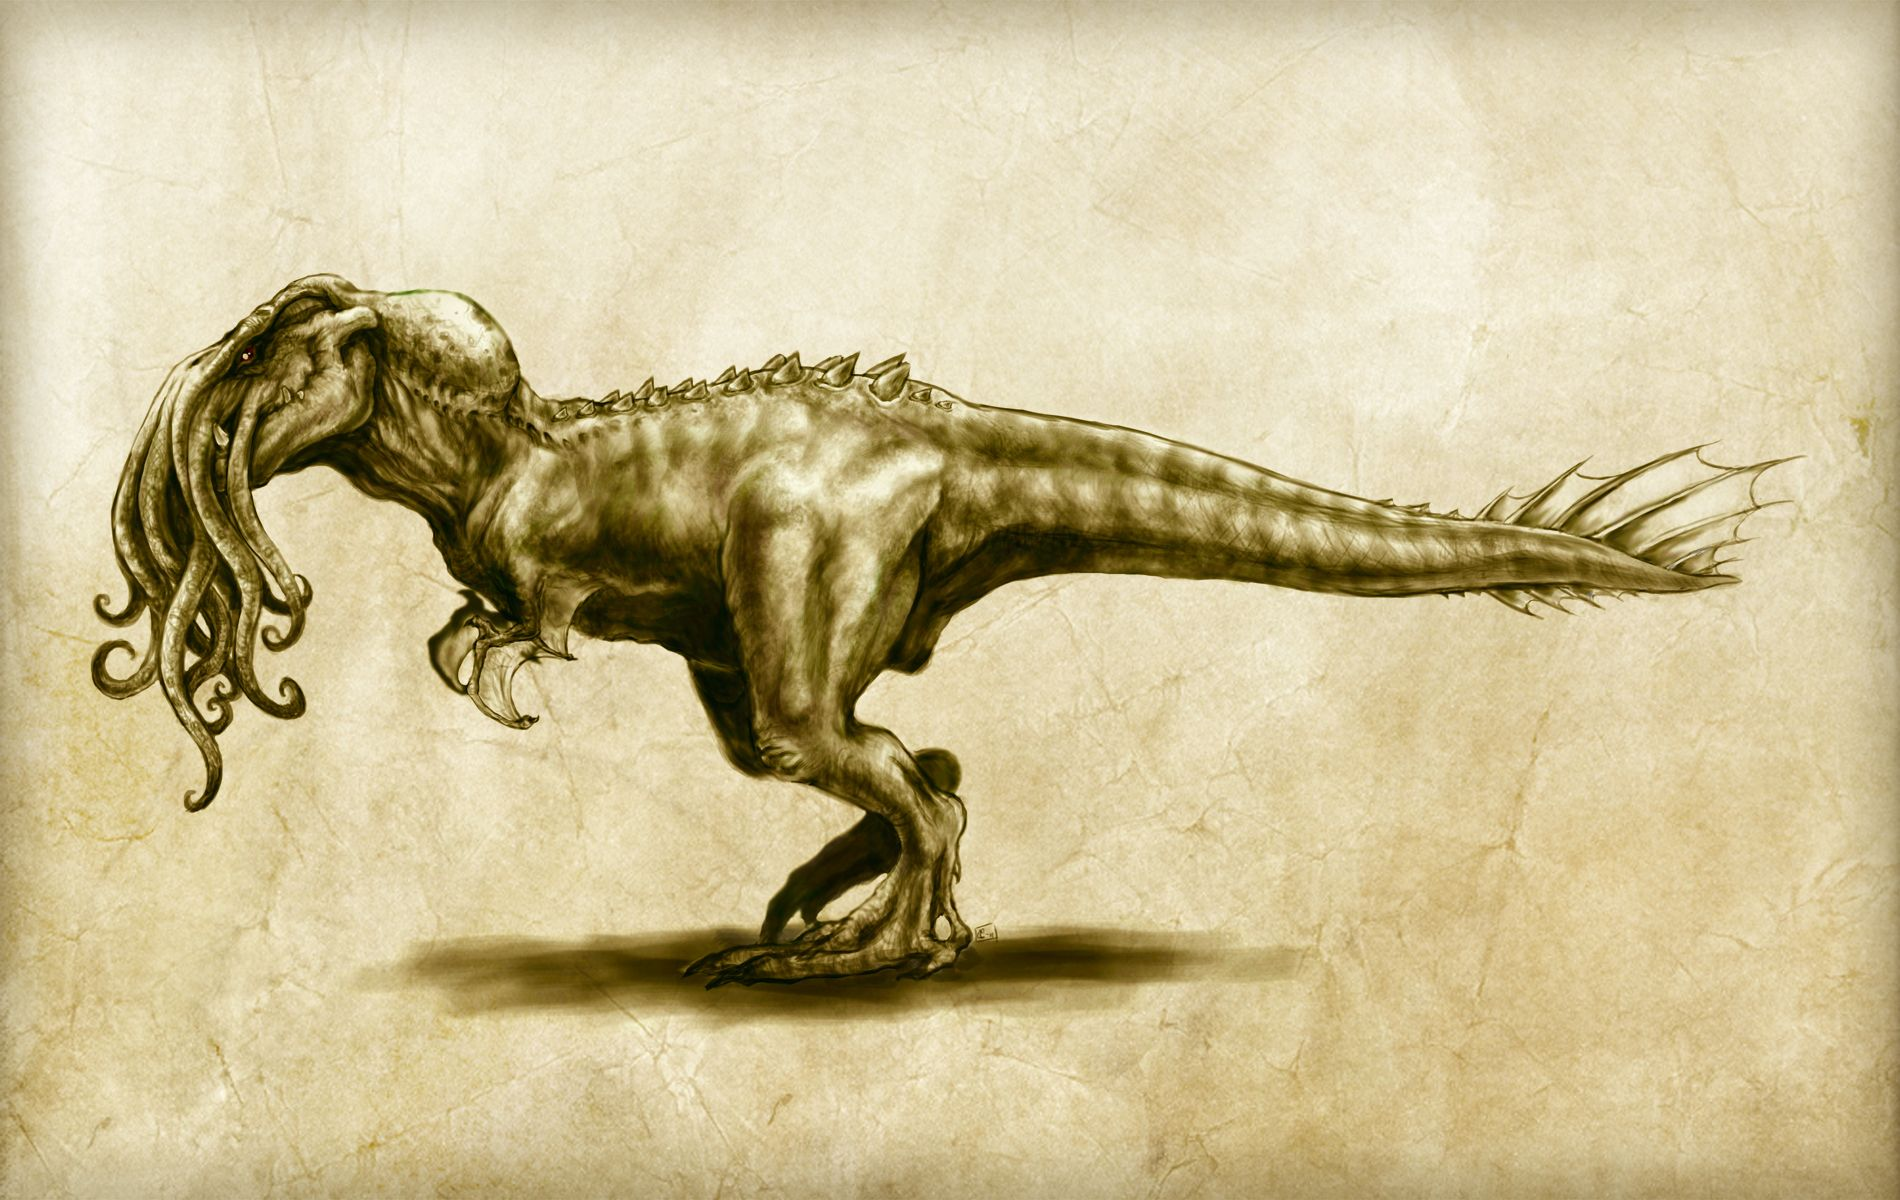 Cthulhu dinosaur wallpaper